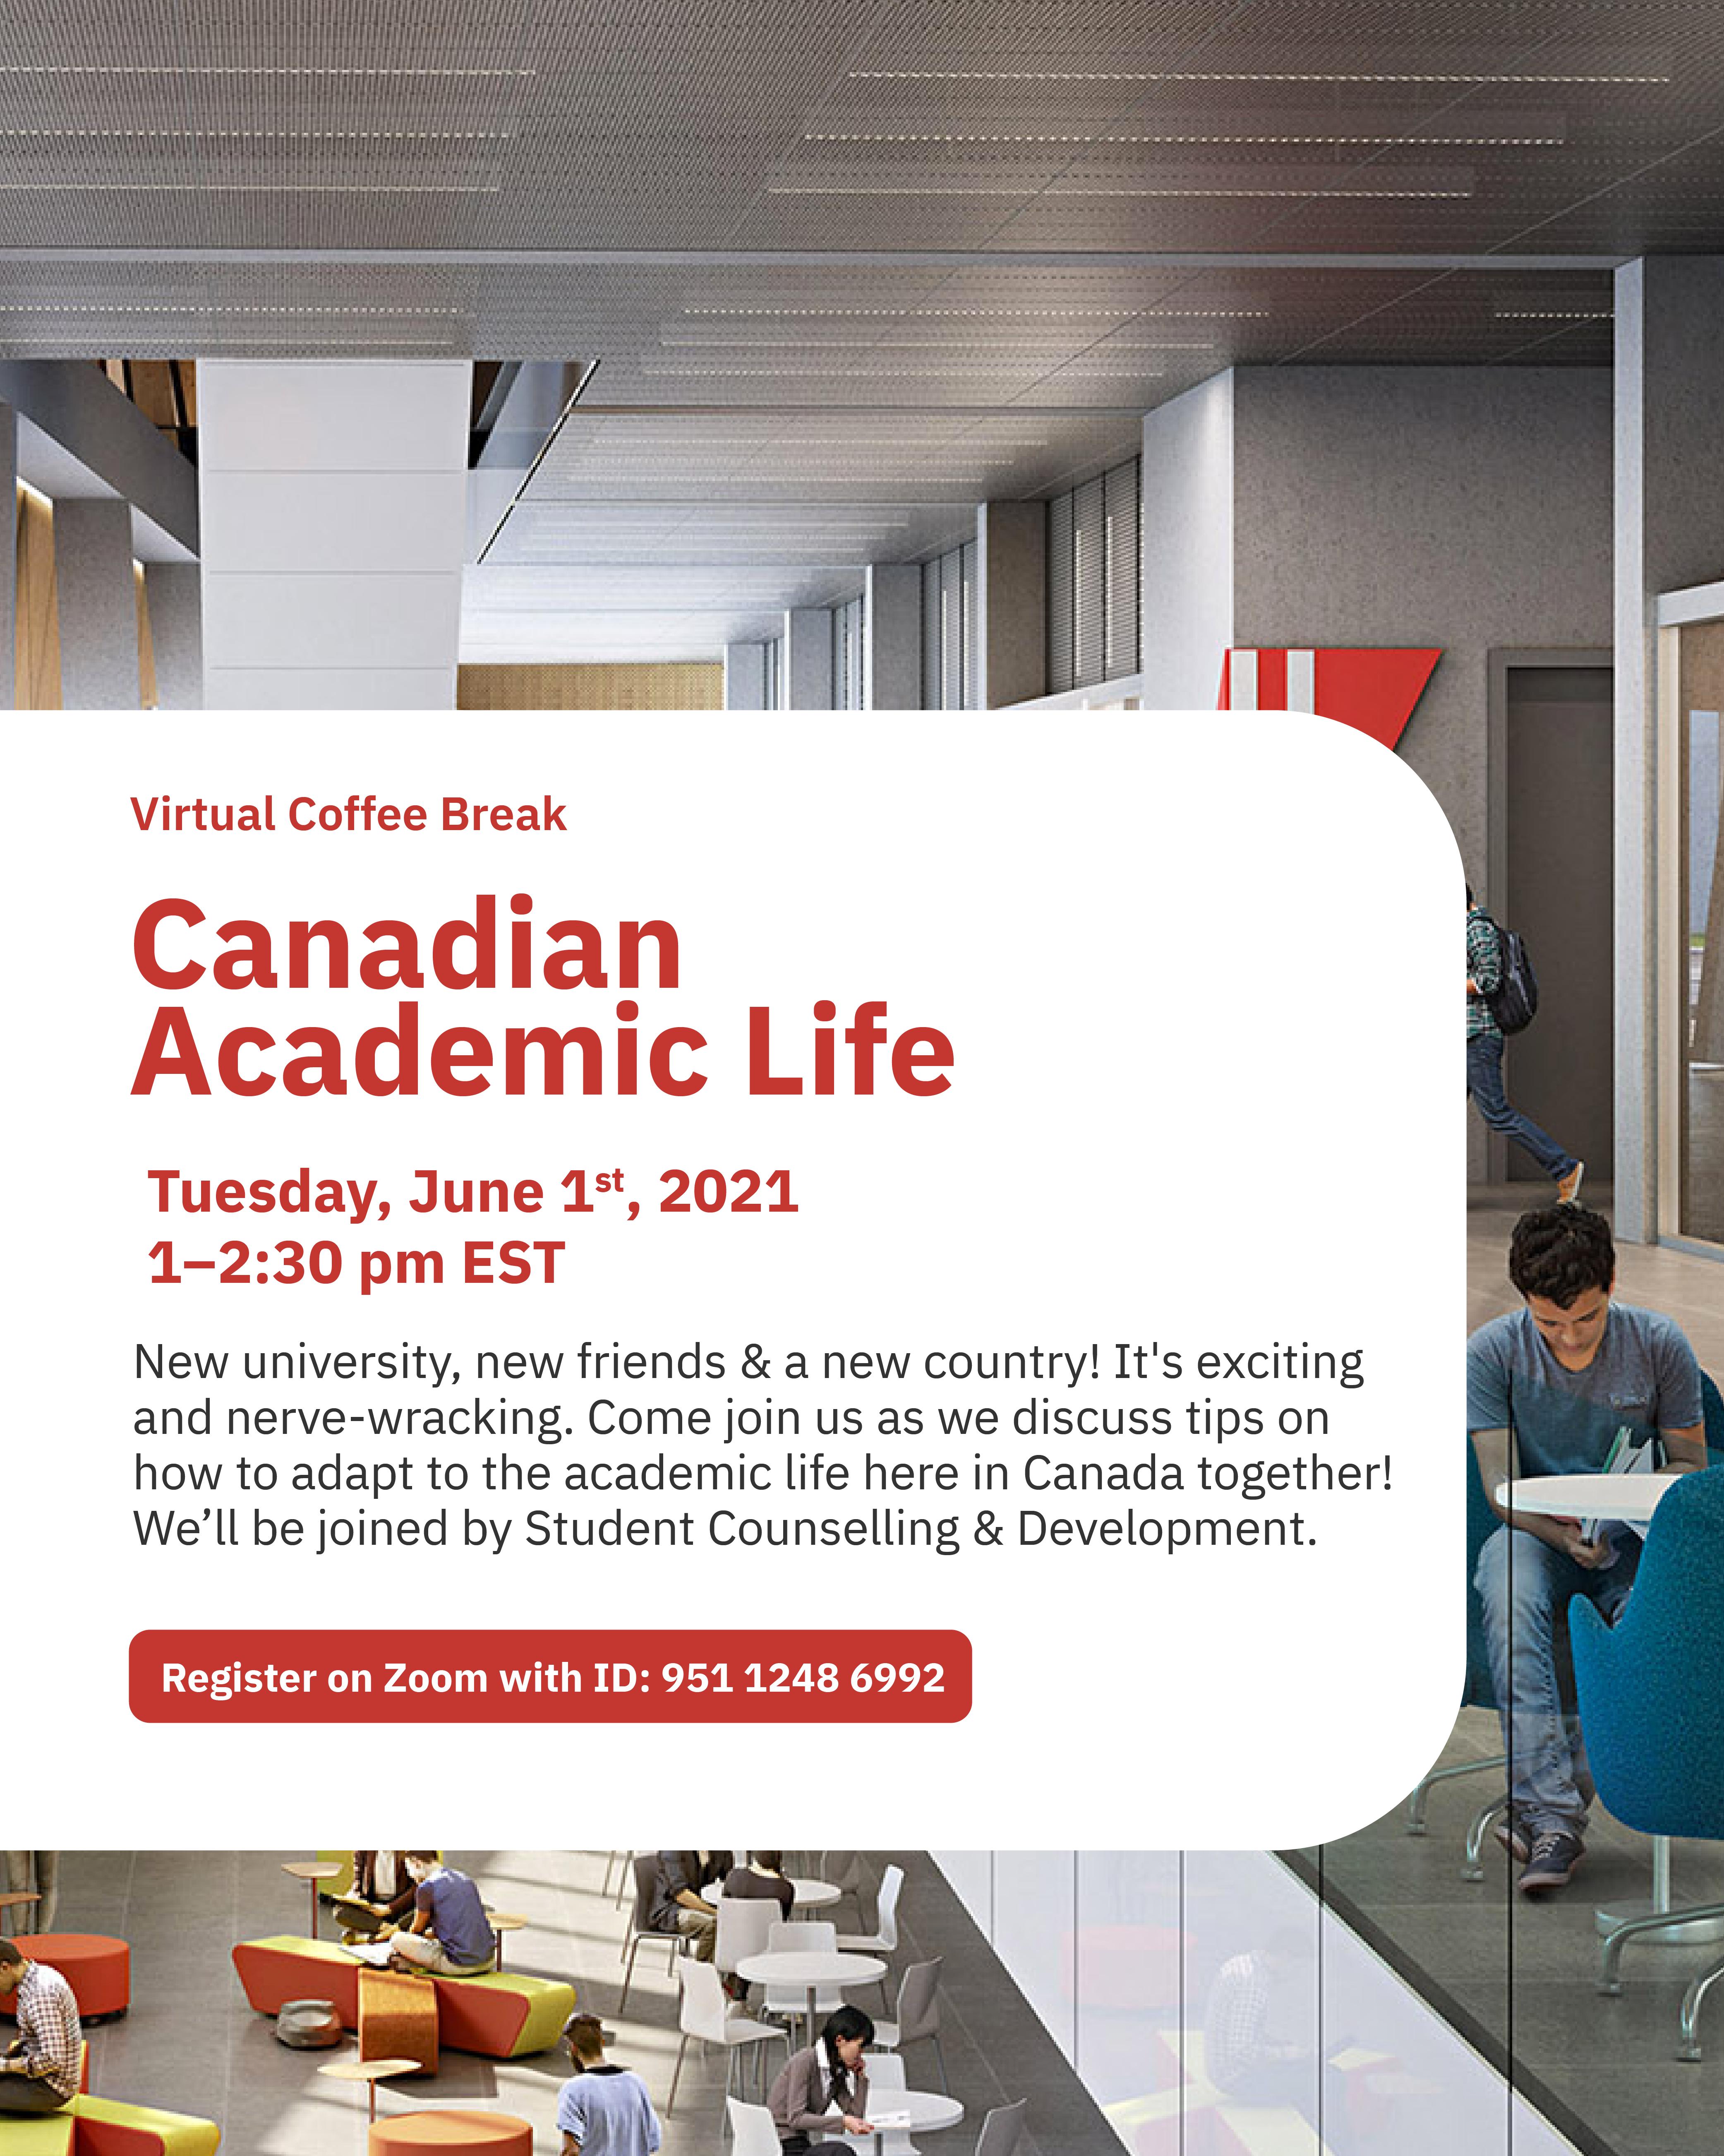 Virtual Coffee Break: Canadian Academic Life @ York International